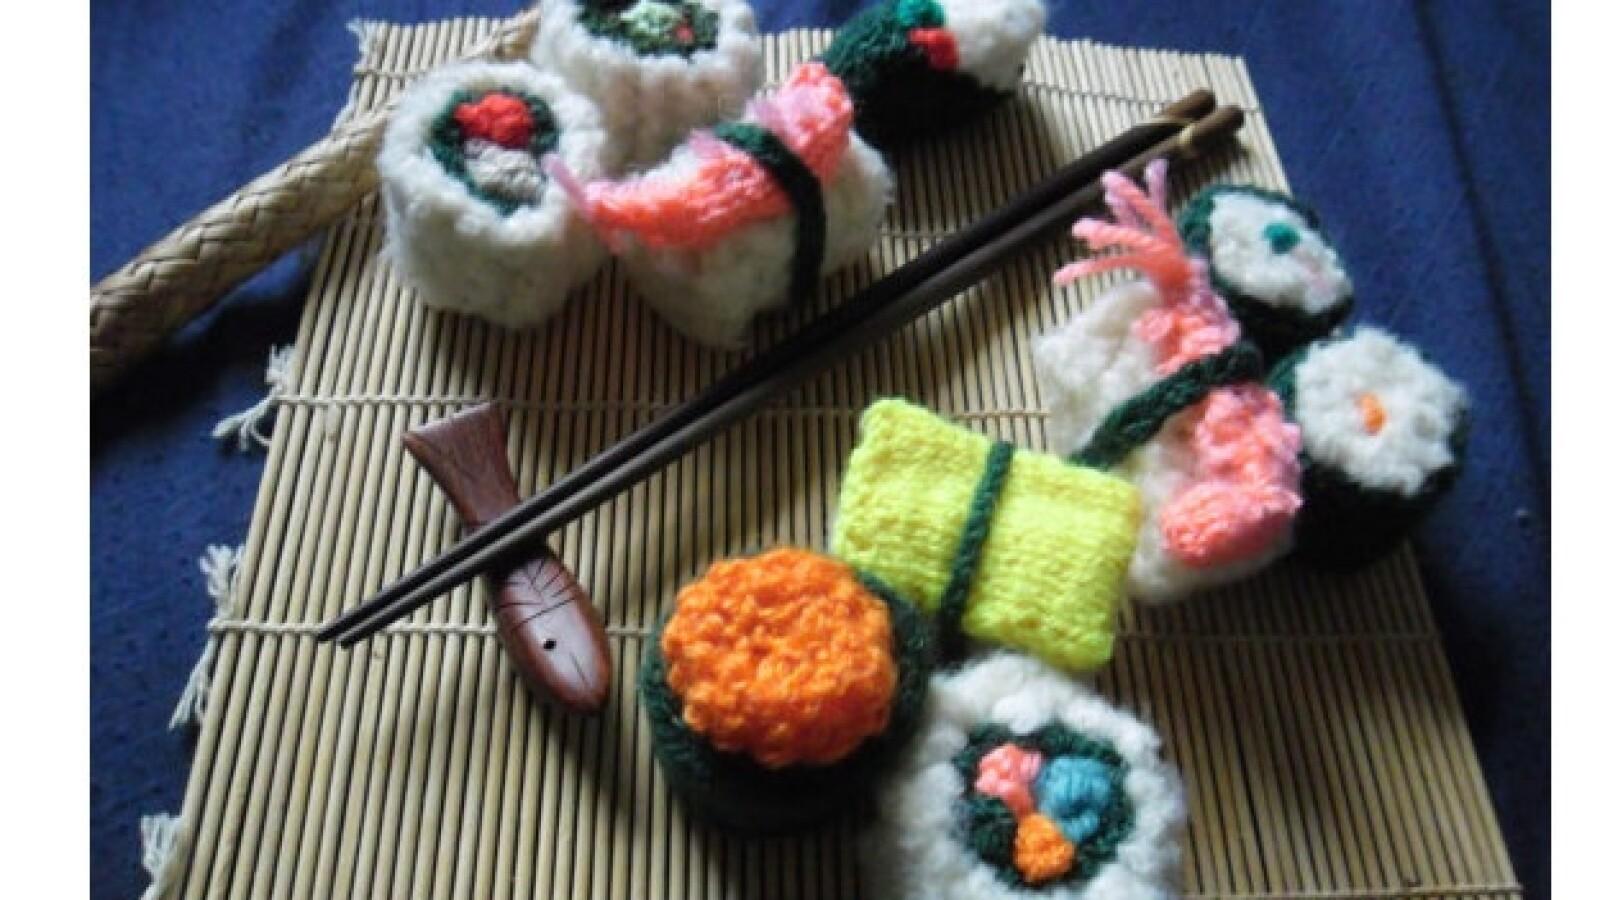 sushi japon alimentos artesanias objetos juguetes